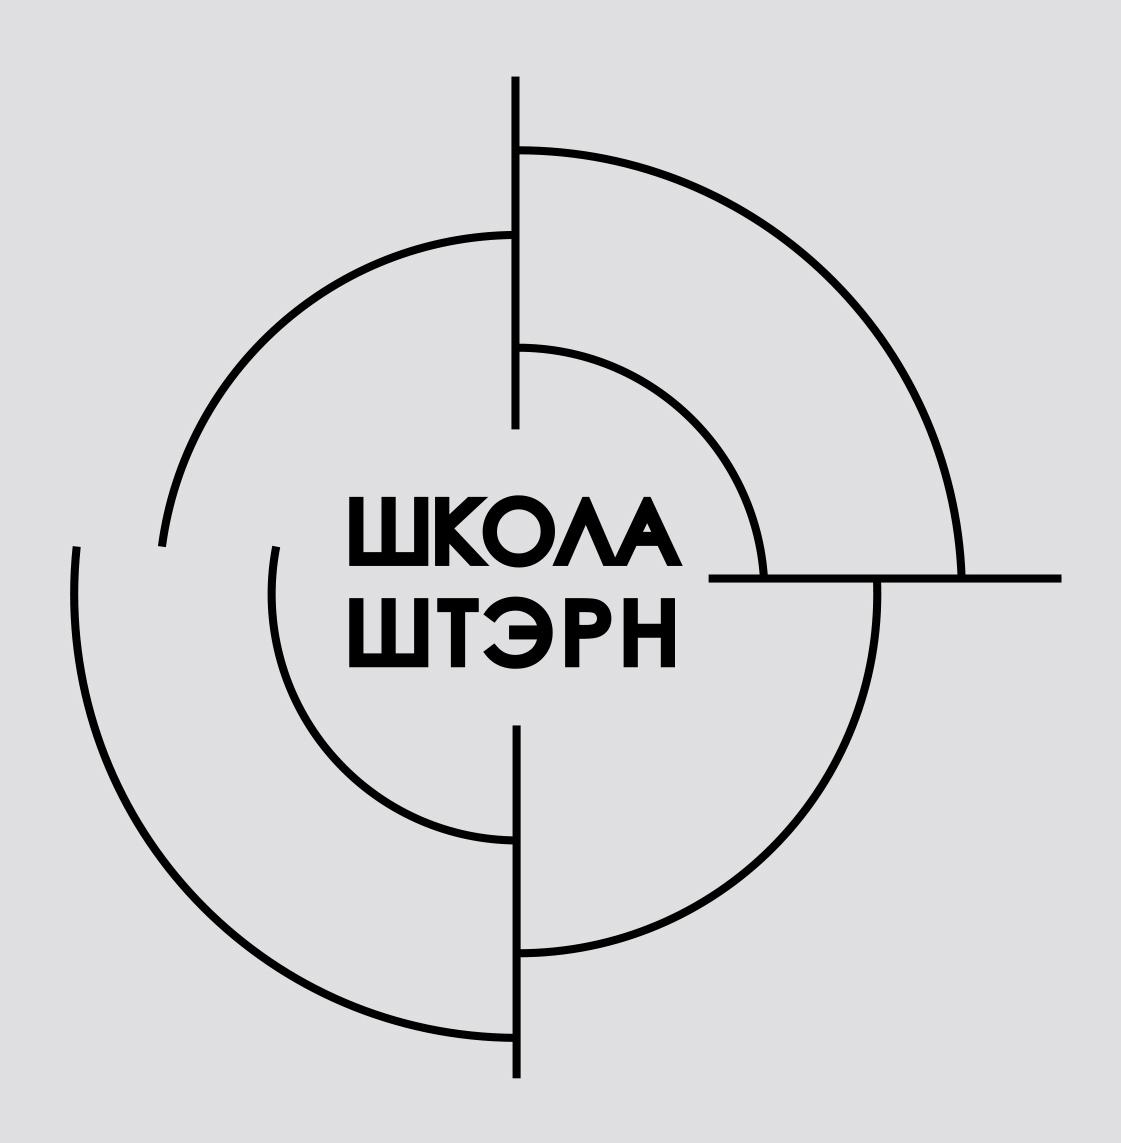 школа ШТЭРН